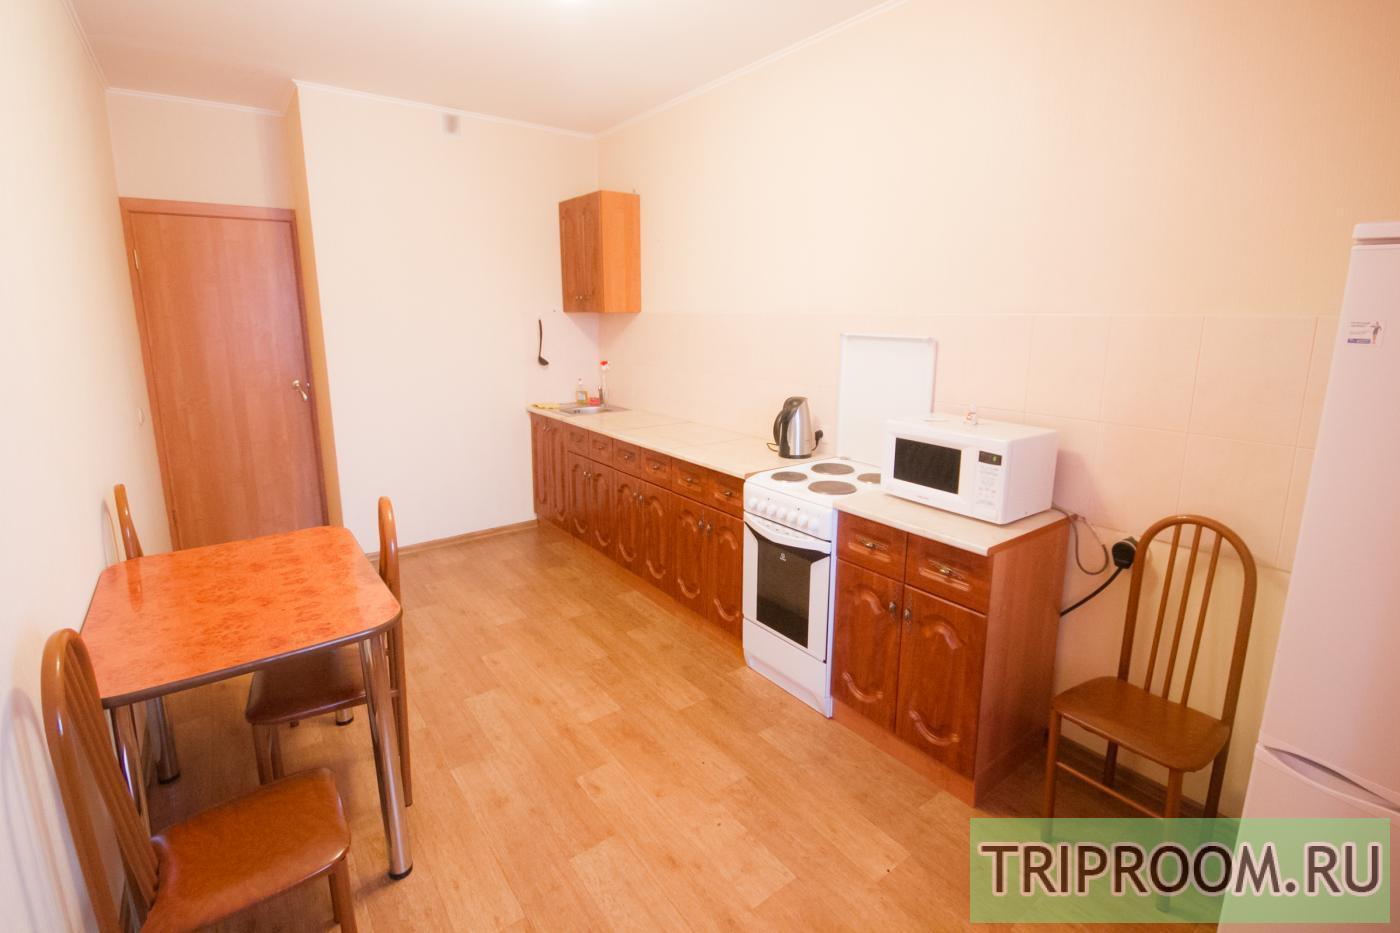 1-комнатная квартира посуточно (вариант № 9382), ул. Галущака улица, фото № 8